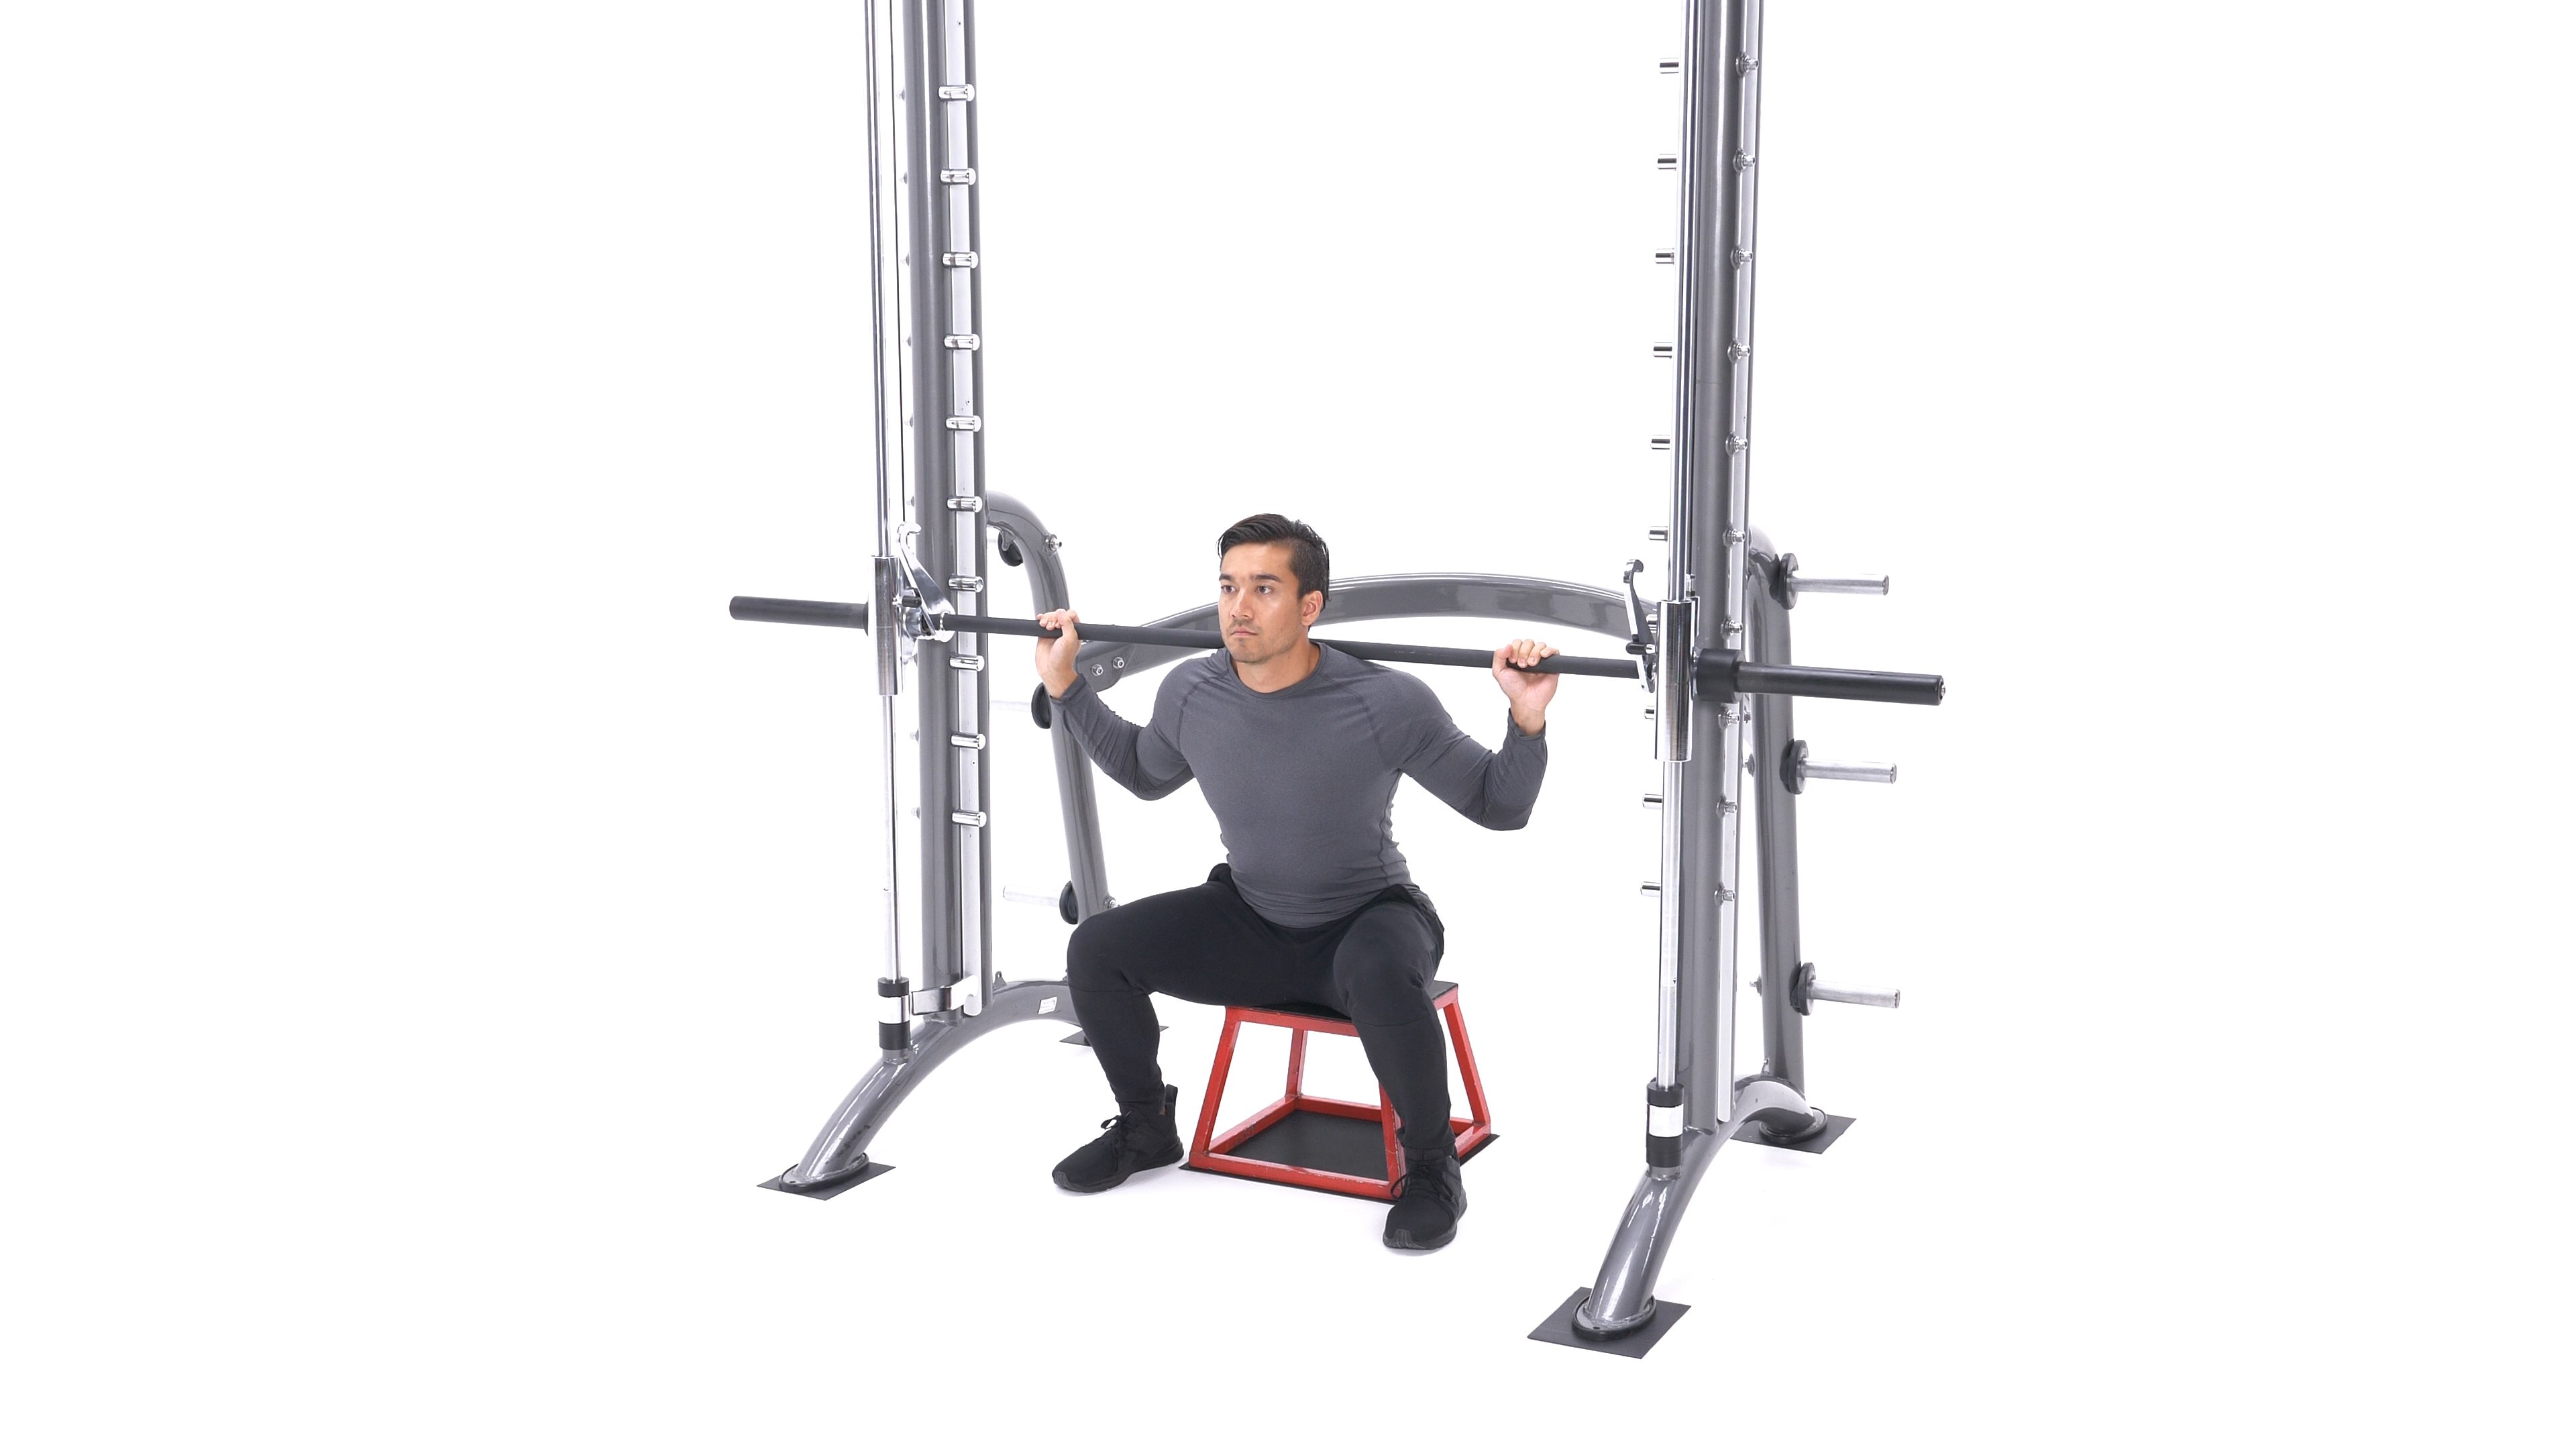 Smith machine box squat image